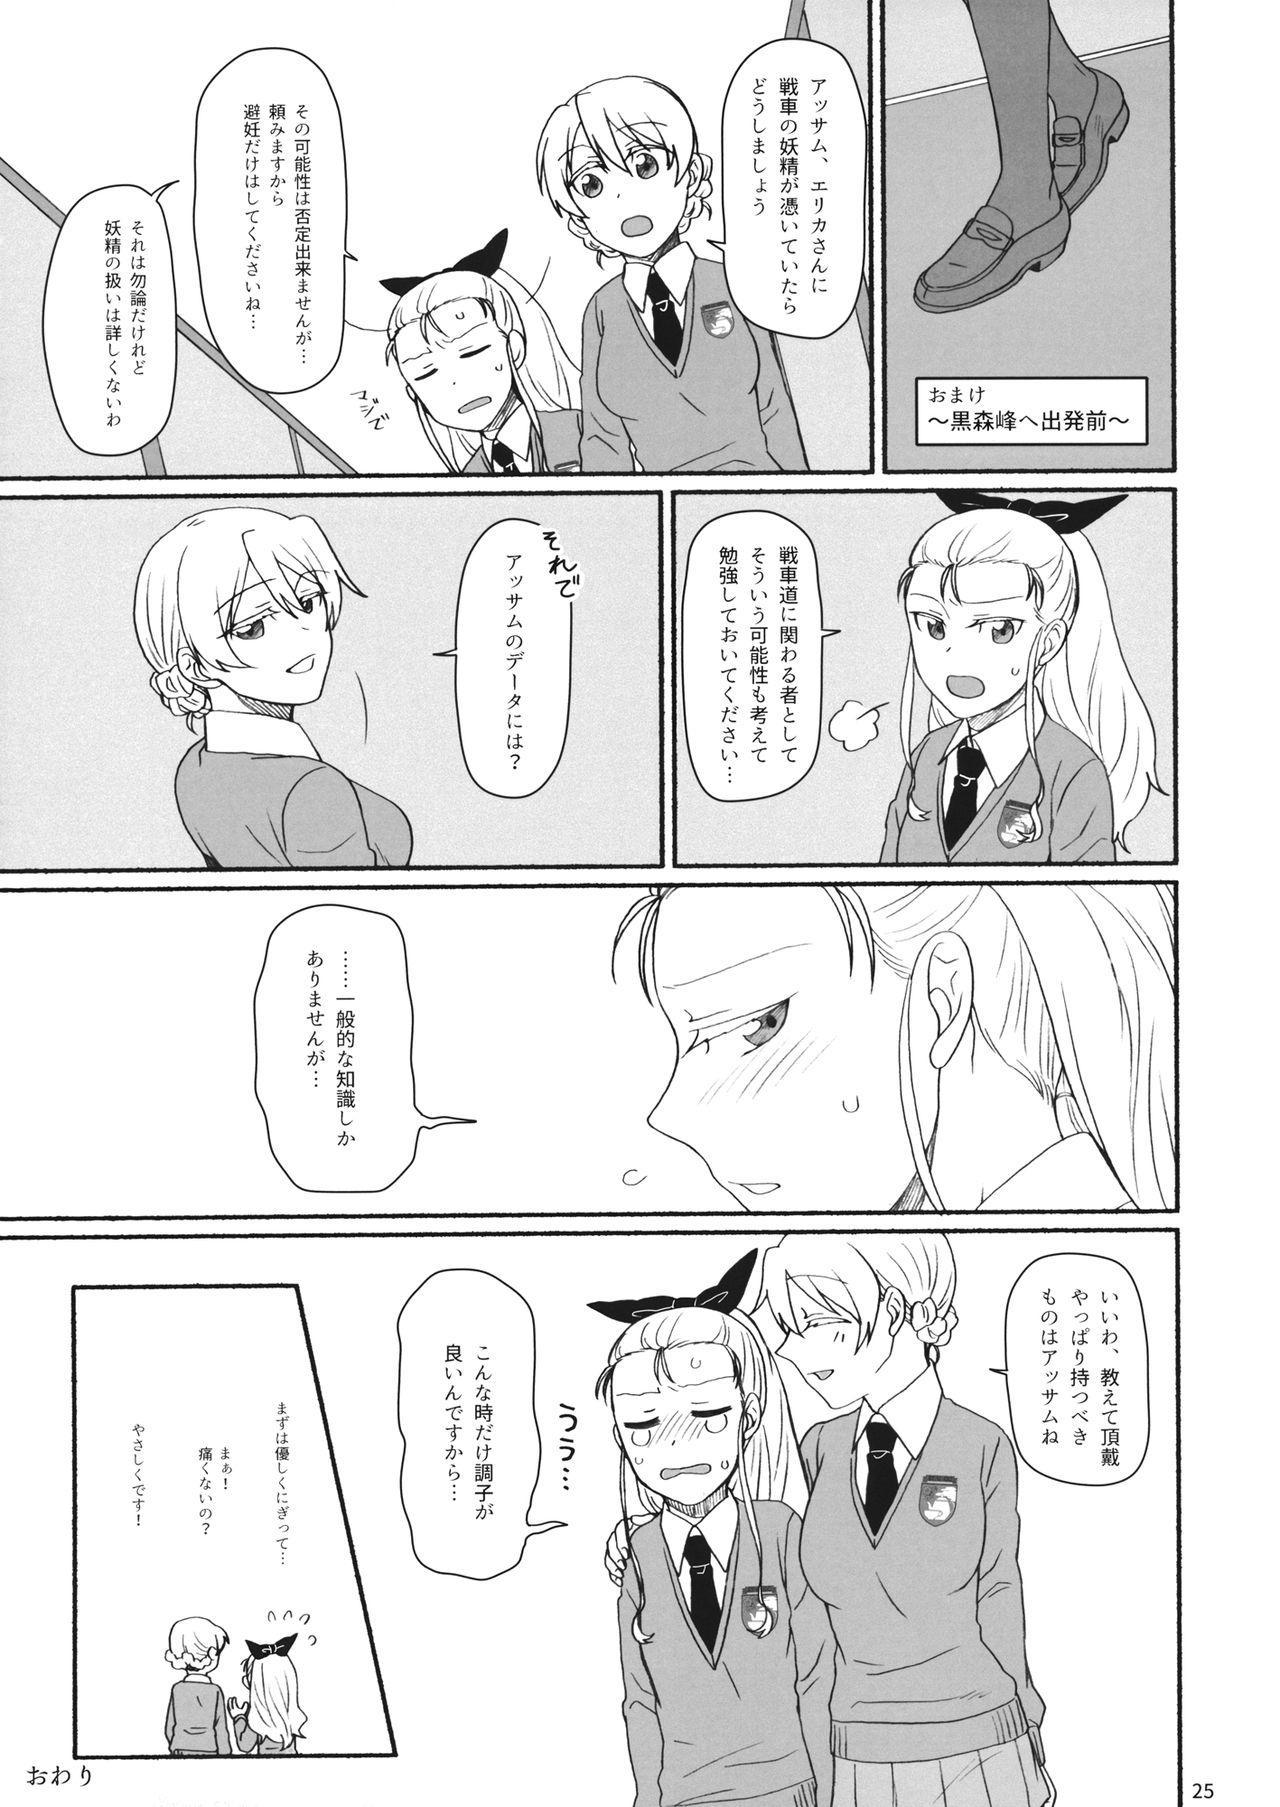 Atsui Koucha de Tea Time 23